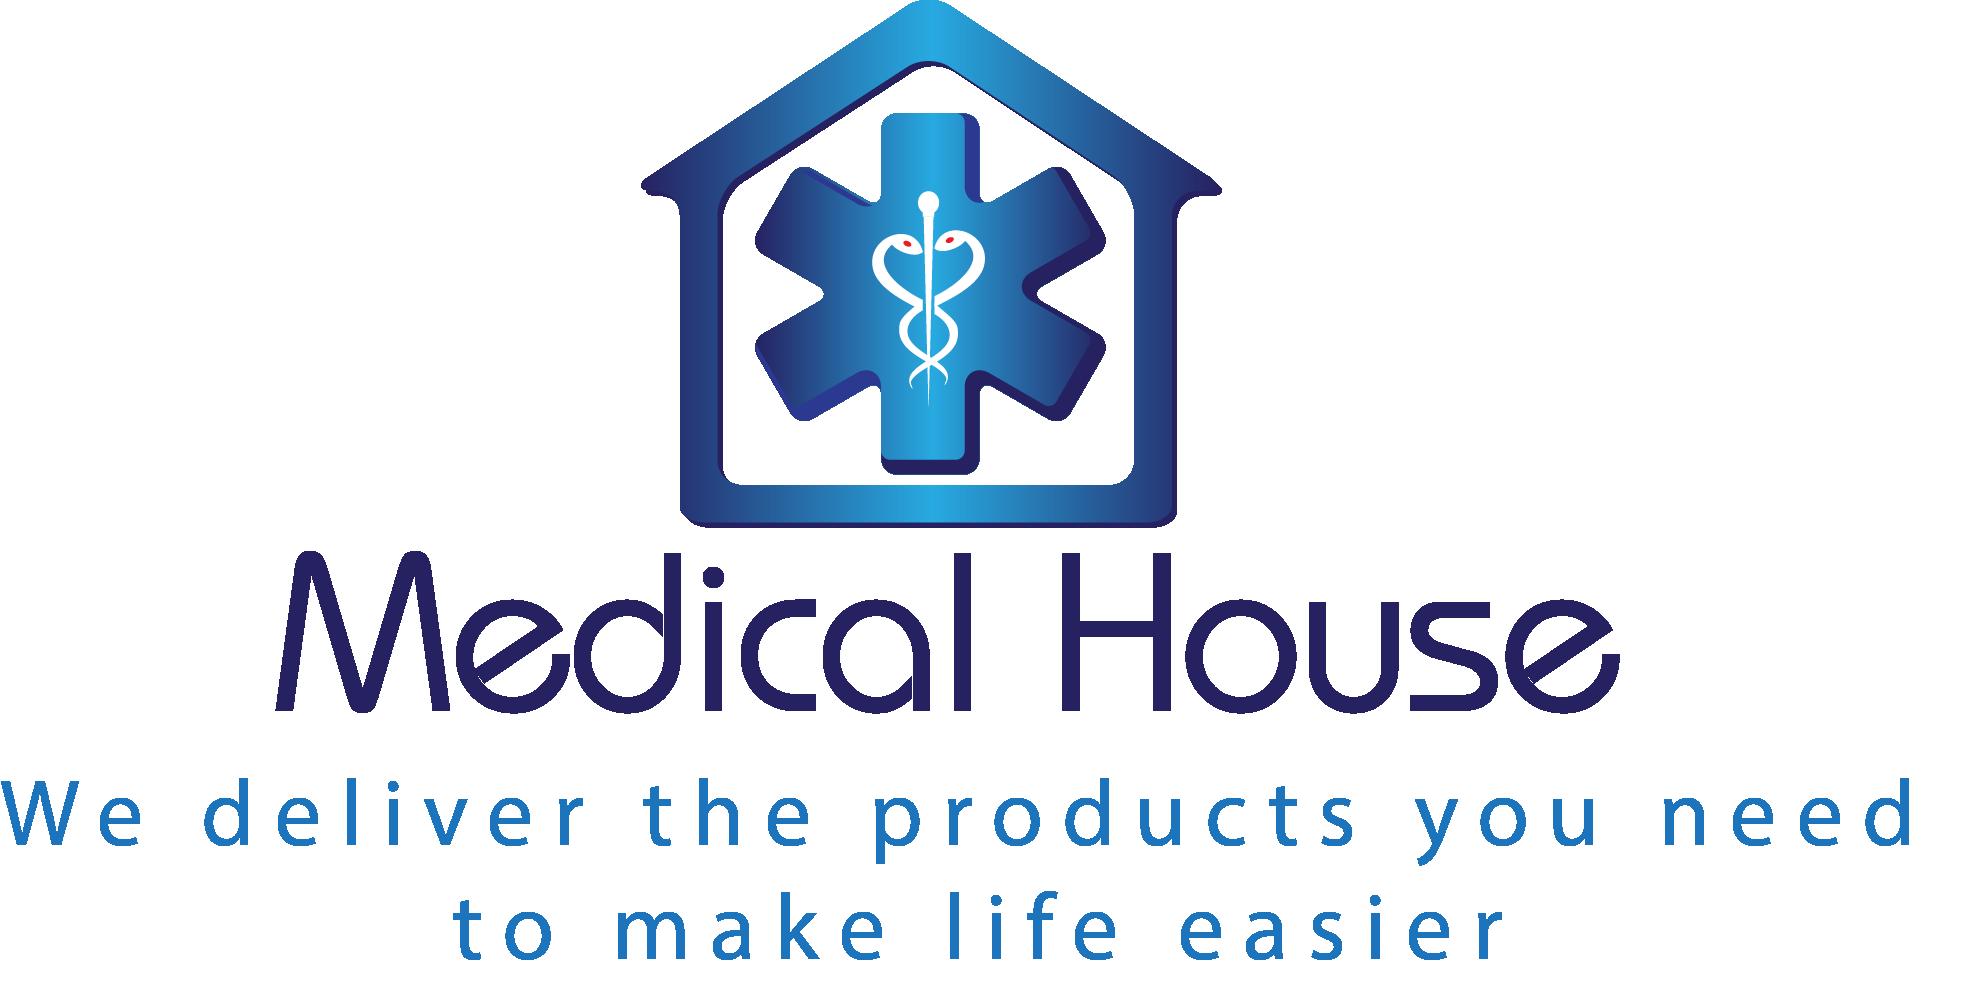 Medical House